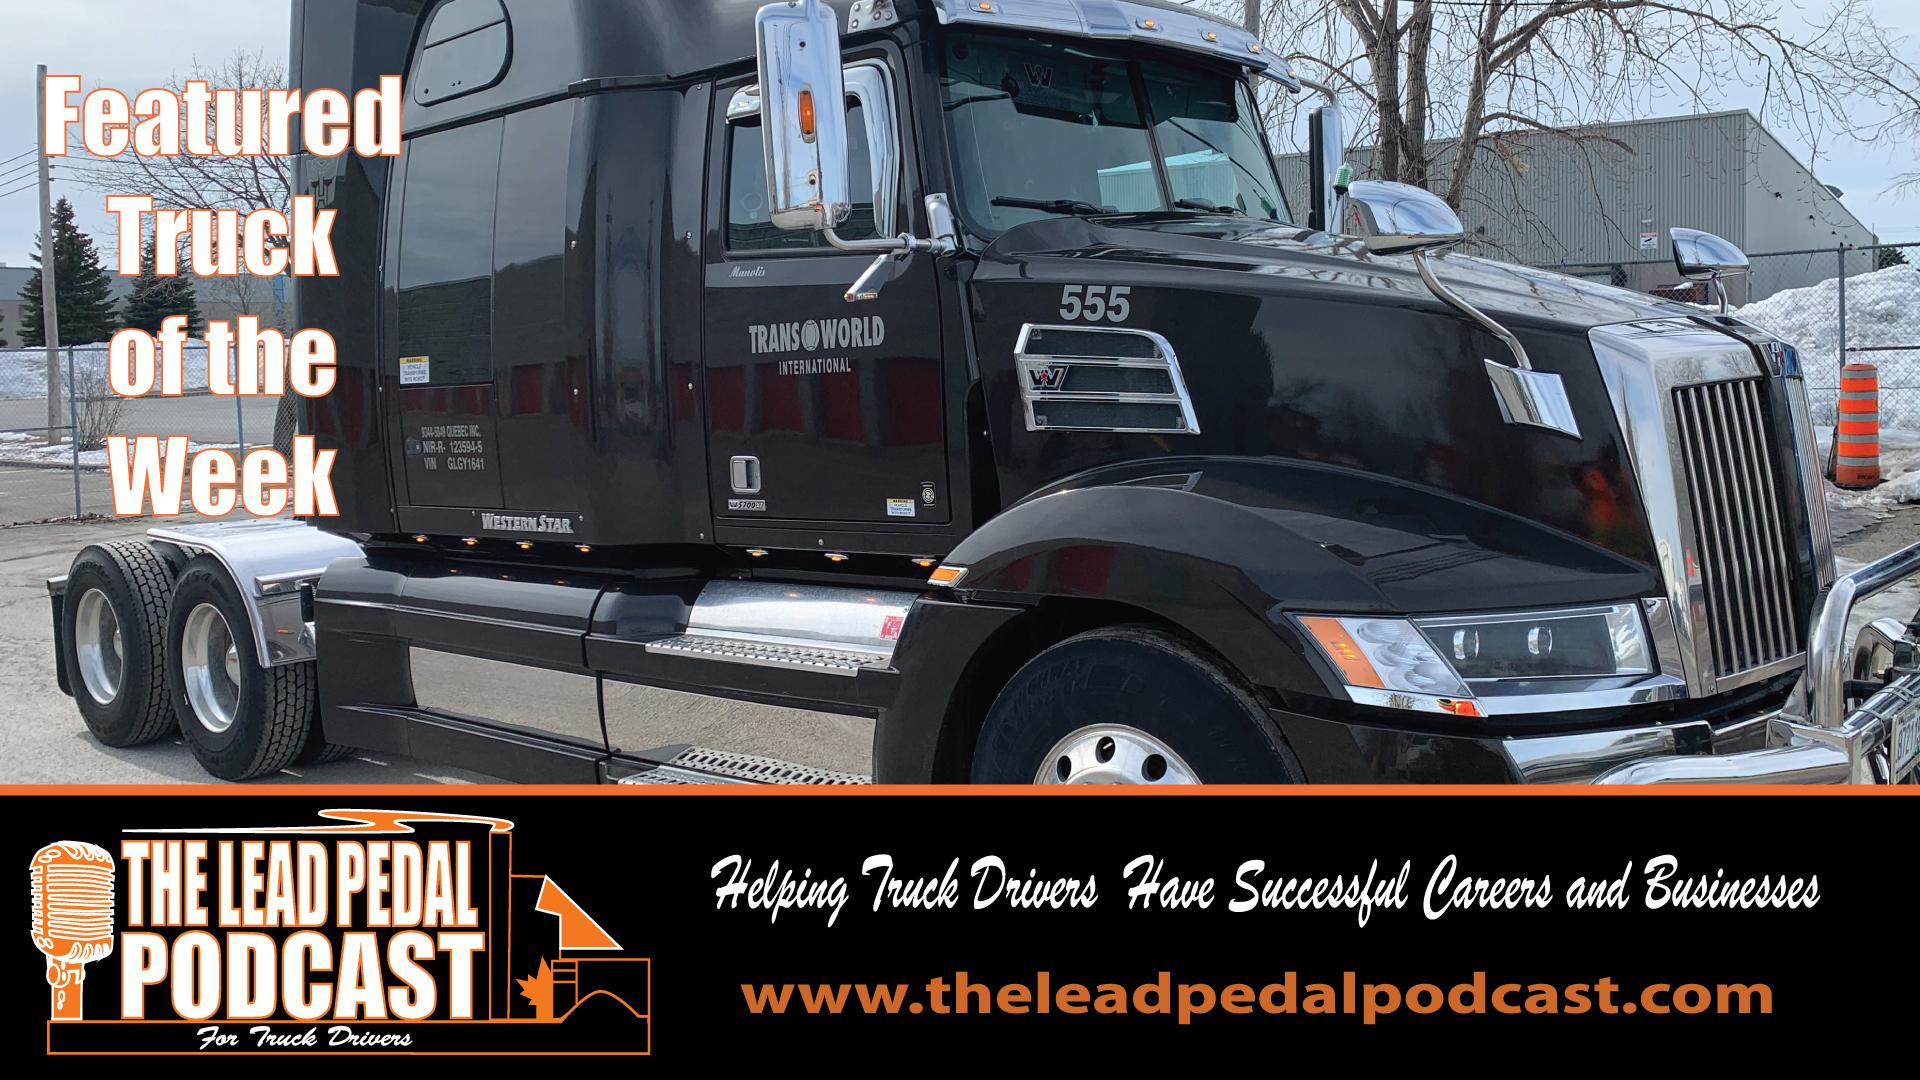 LP618 Featured Truck of the Week-Black 5700 Western Star